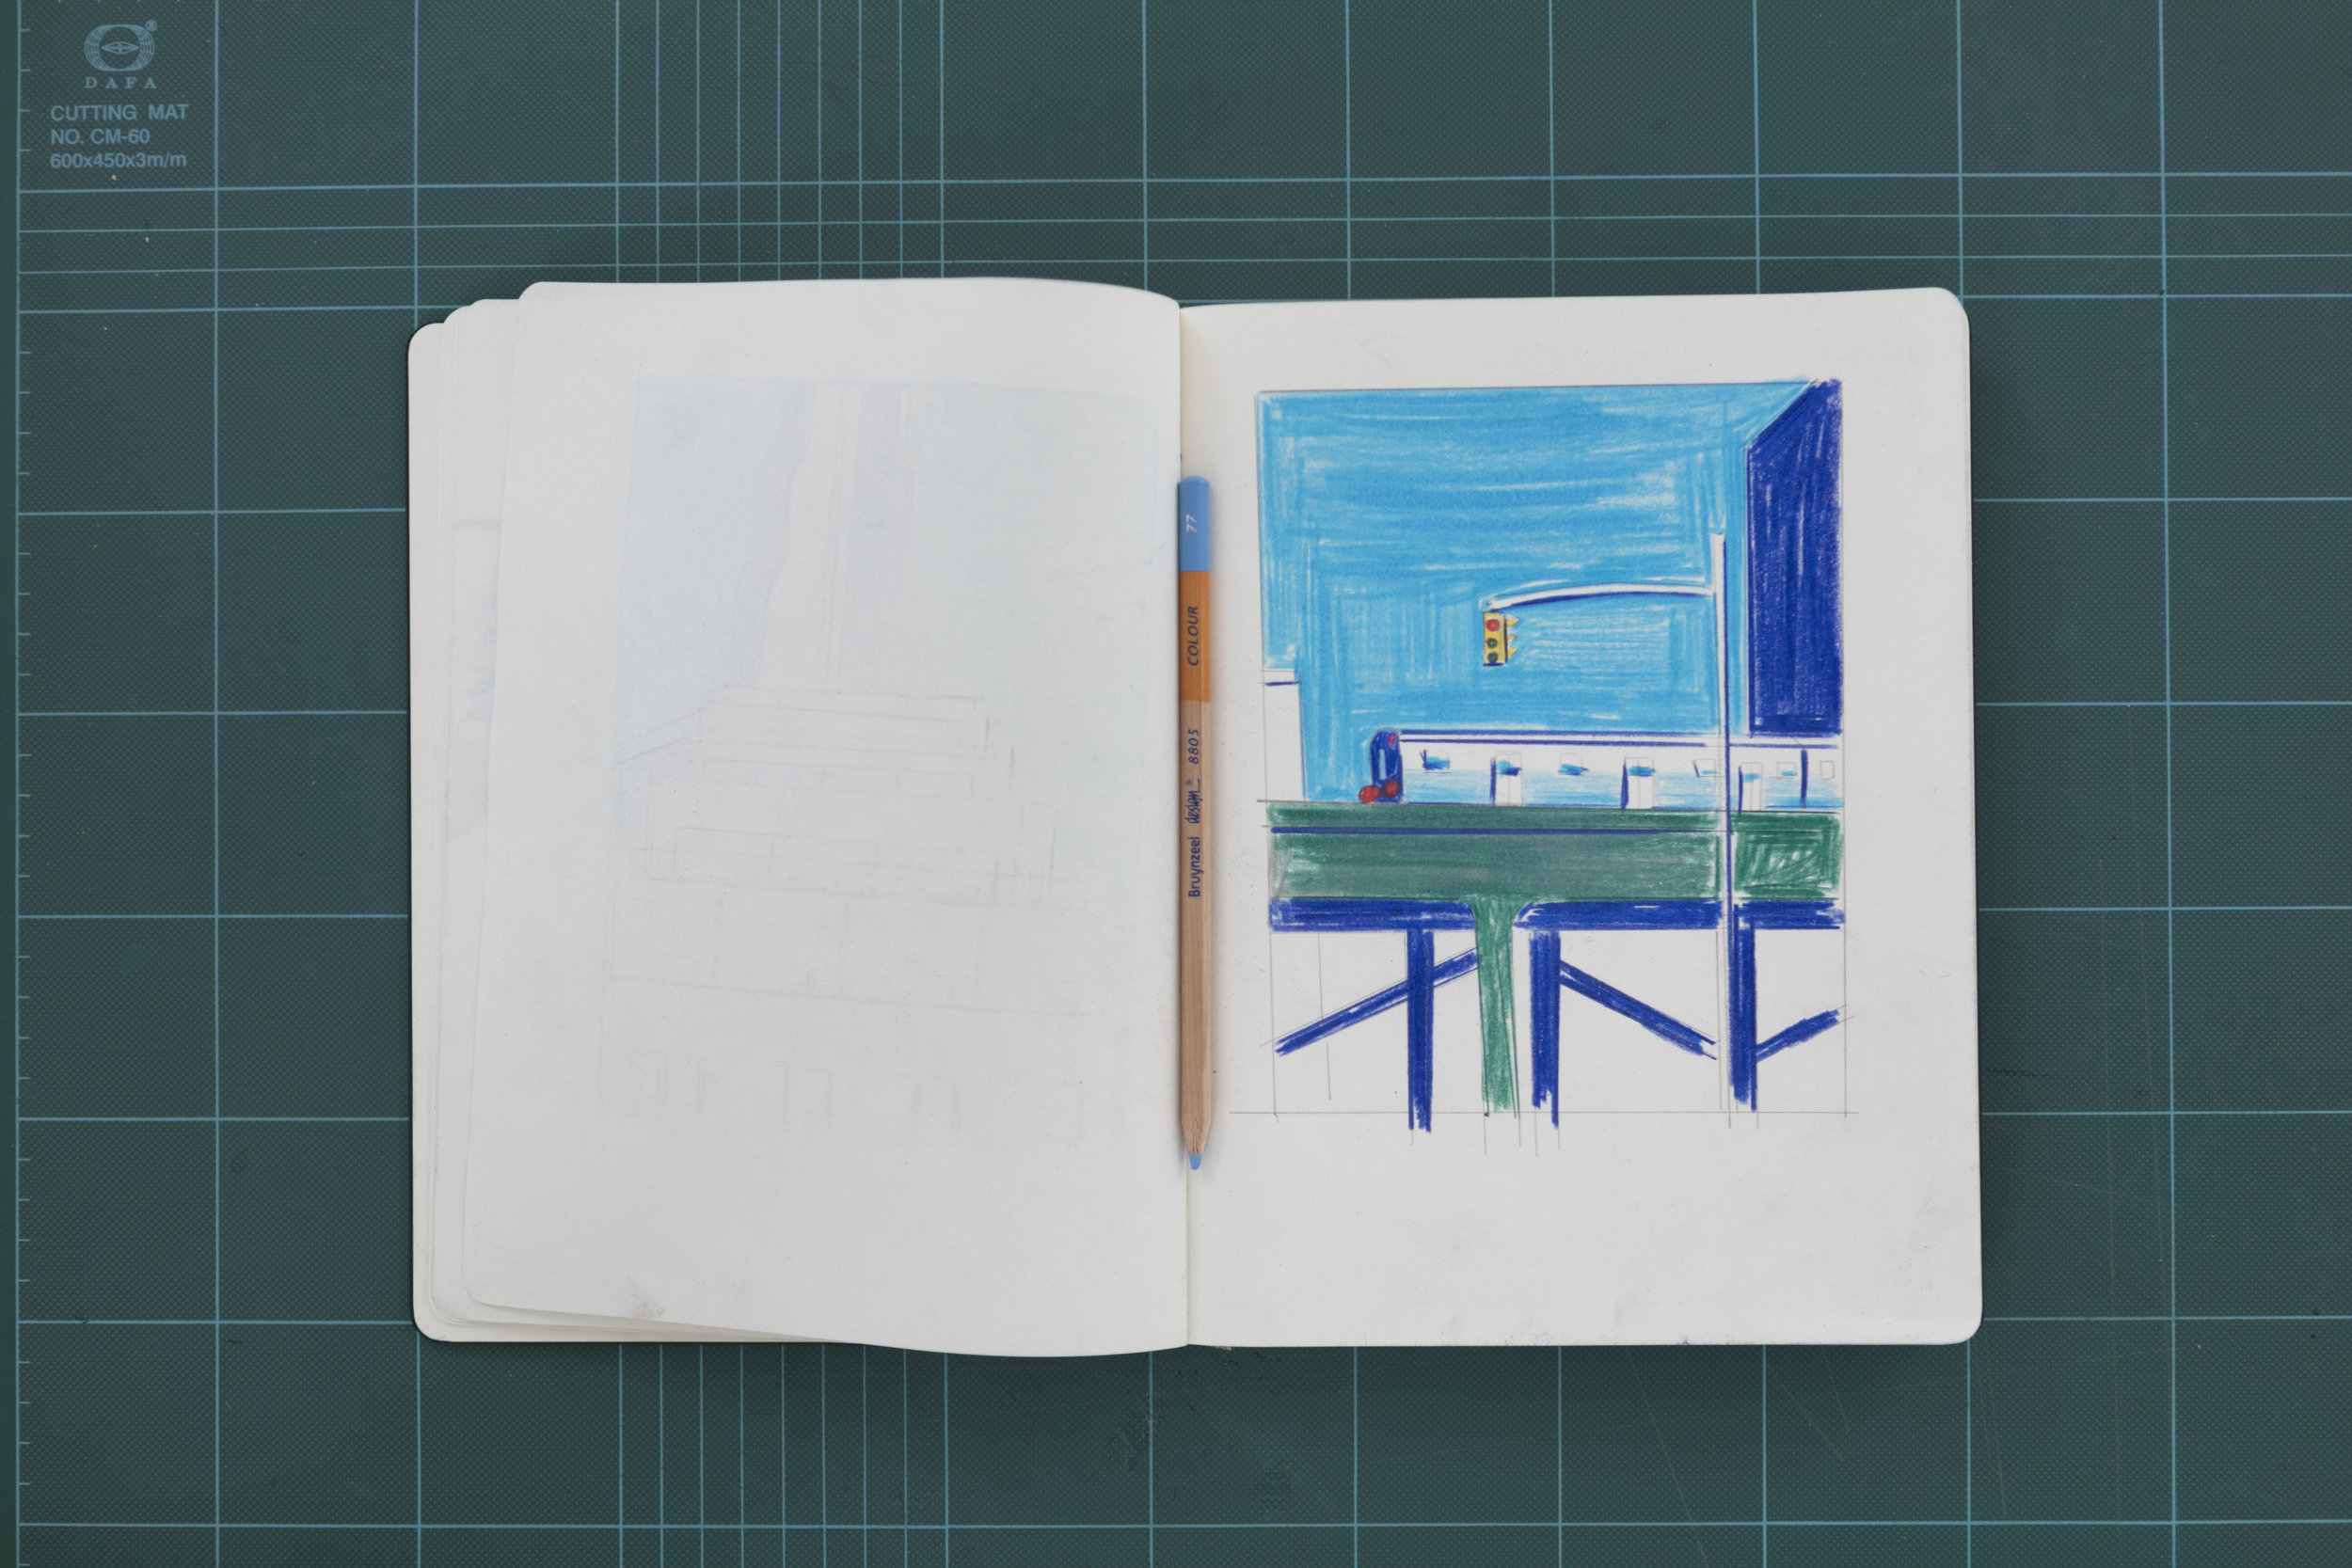 GreatNYSubwayMap_MoMA_Sketch_1.jpg